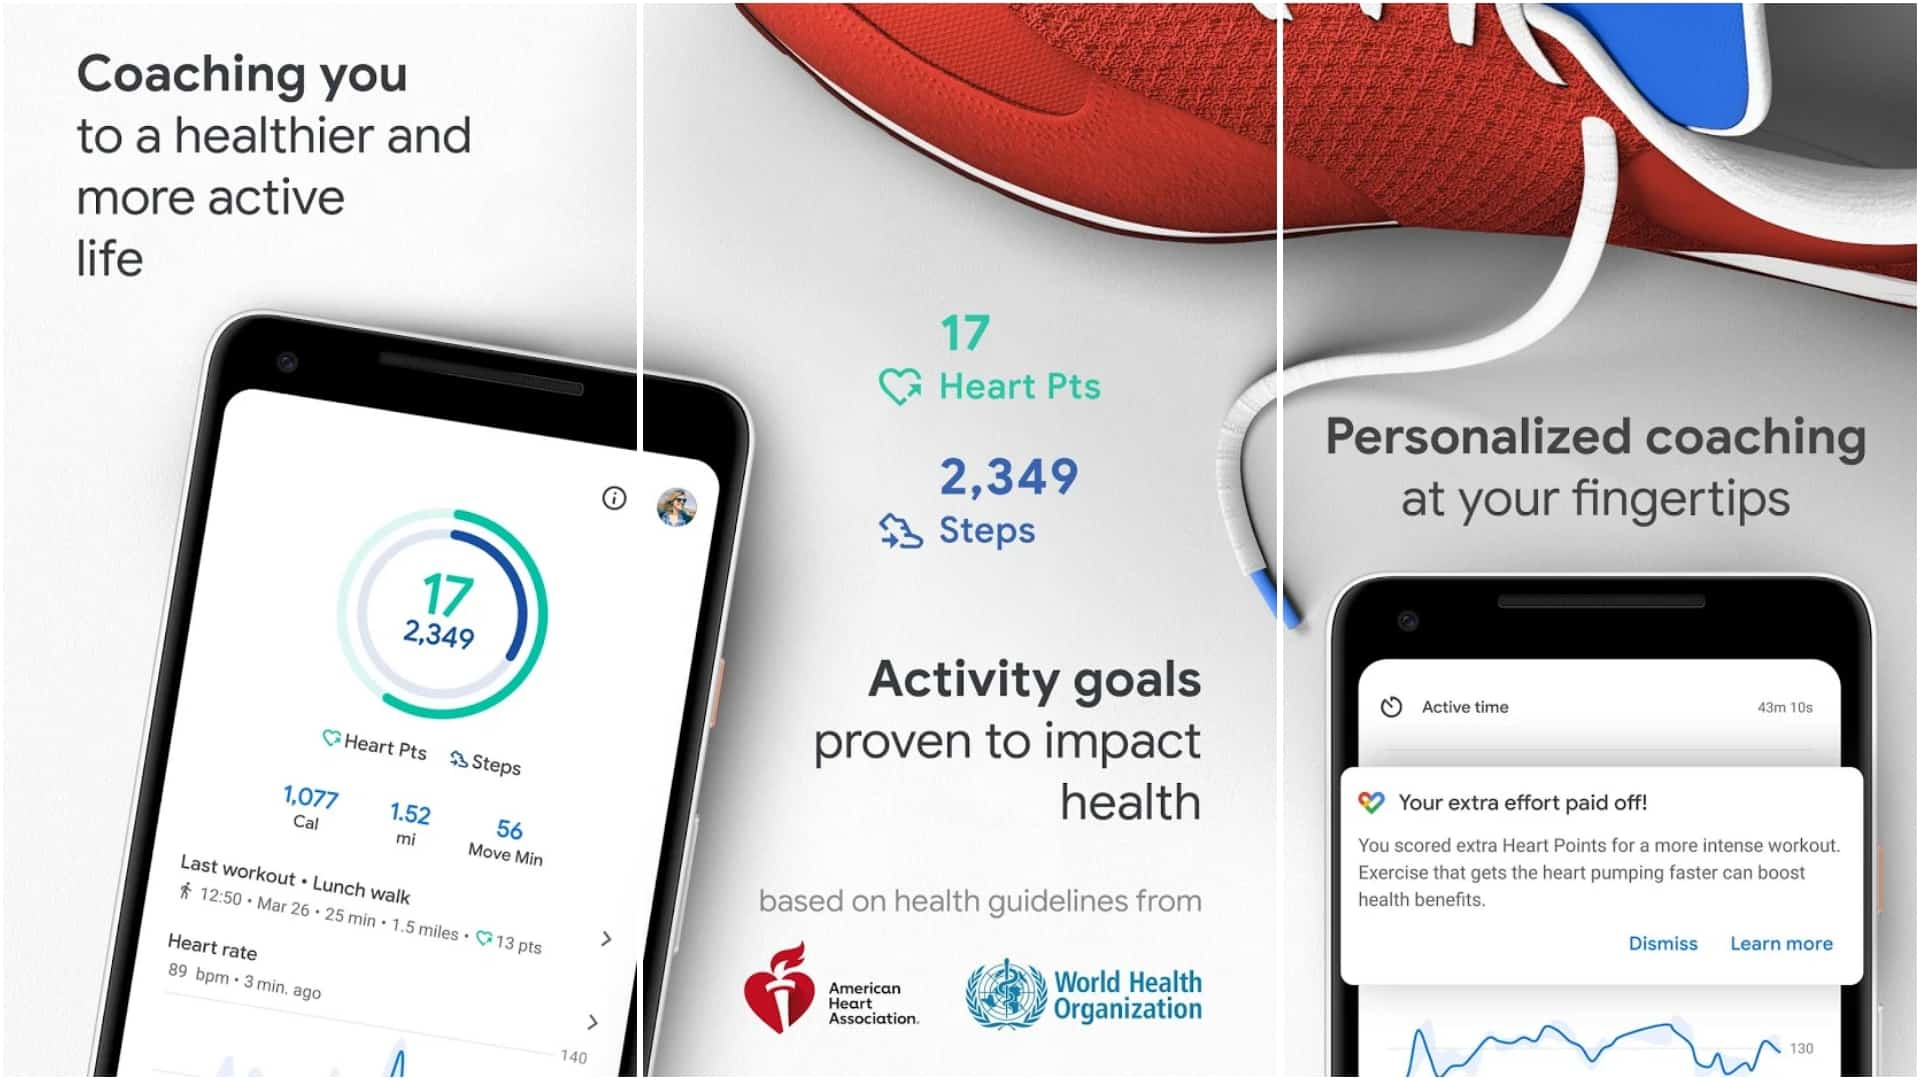 Google Fit app image April 2020